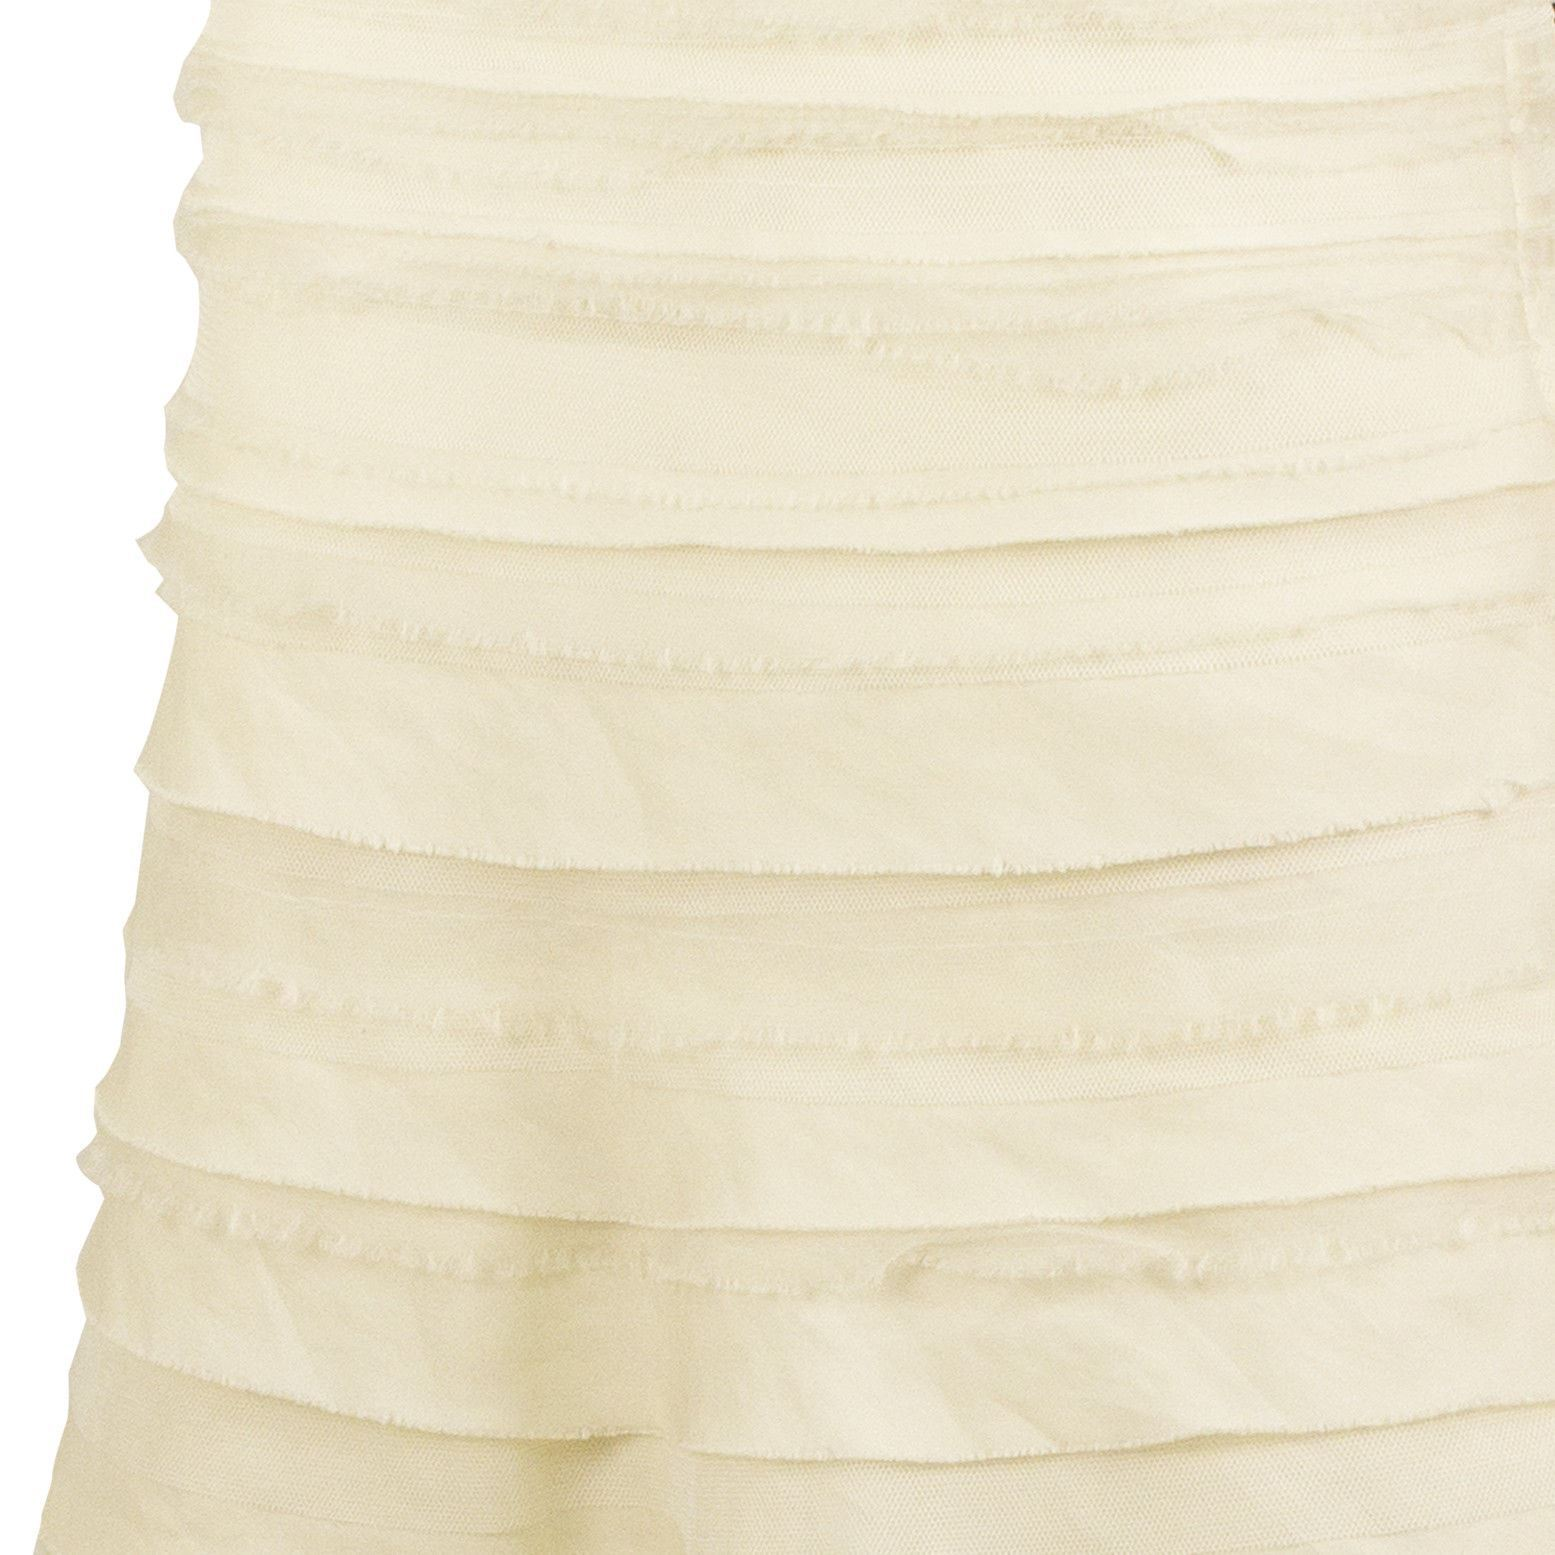 Vera Wang Silk Floor Length Bridal Wedding Gown Dress Strapless US 8 EU 42 image 4